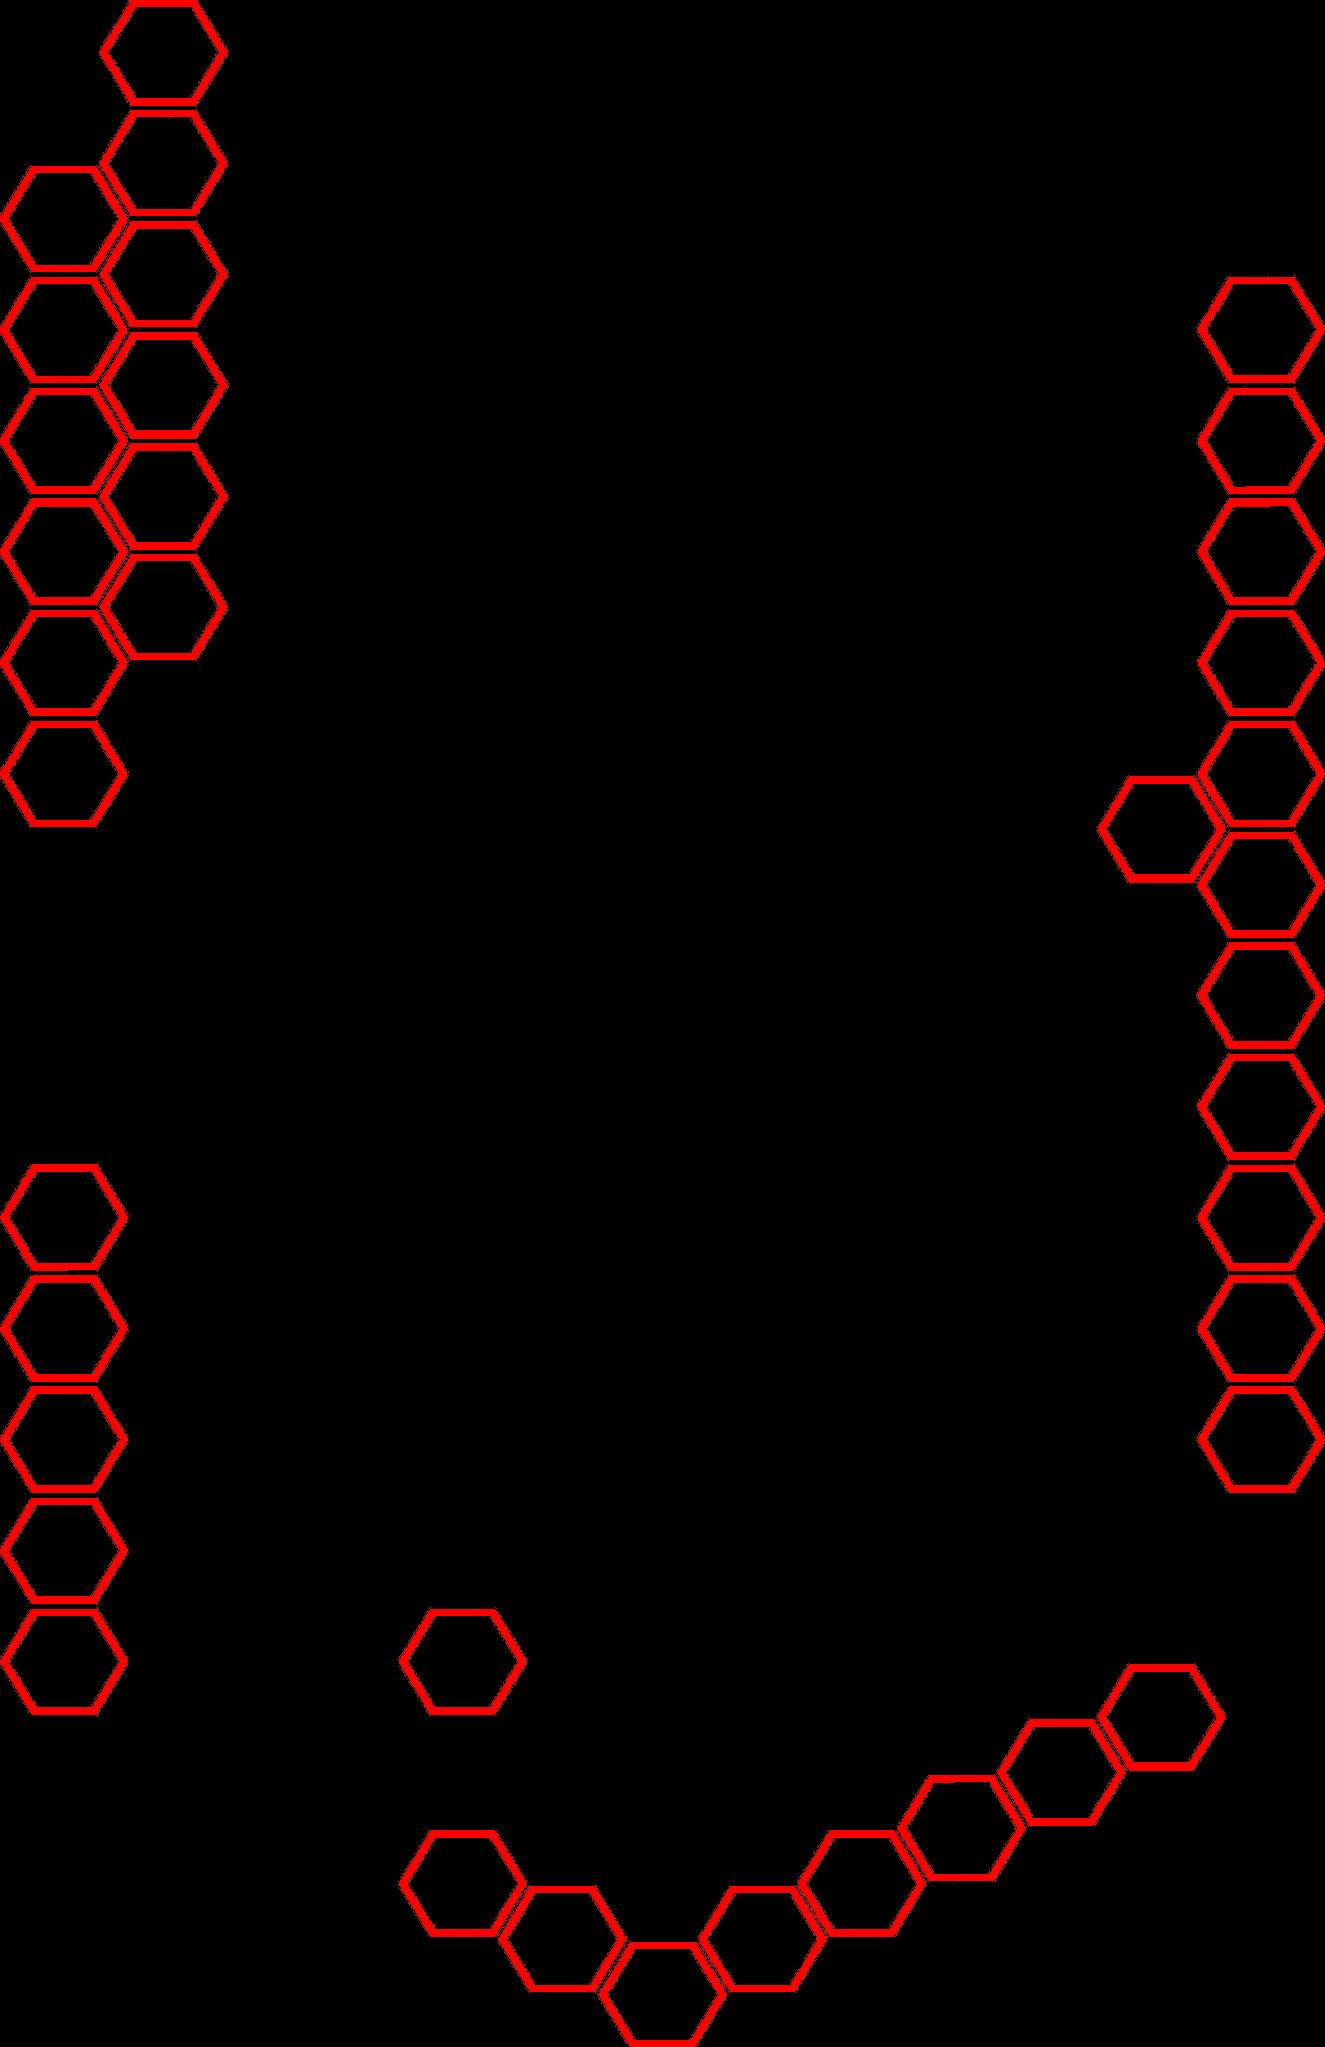 Figure 6b representation of all radioactive elements red in the figure 6b representation of all radioactive elements red in the hexagonal periodic table gamestrikefo Gallery